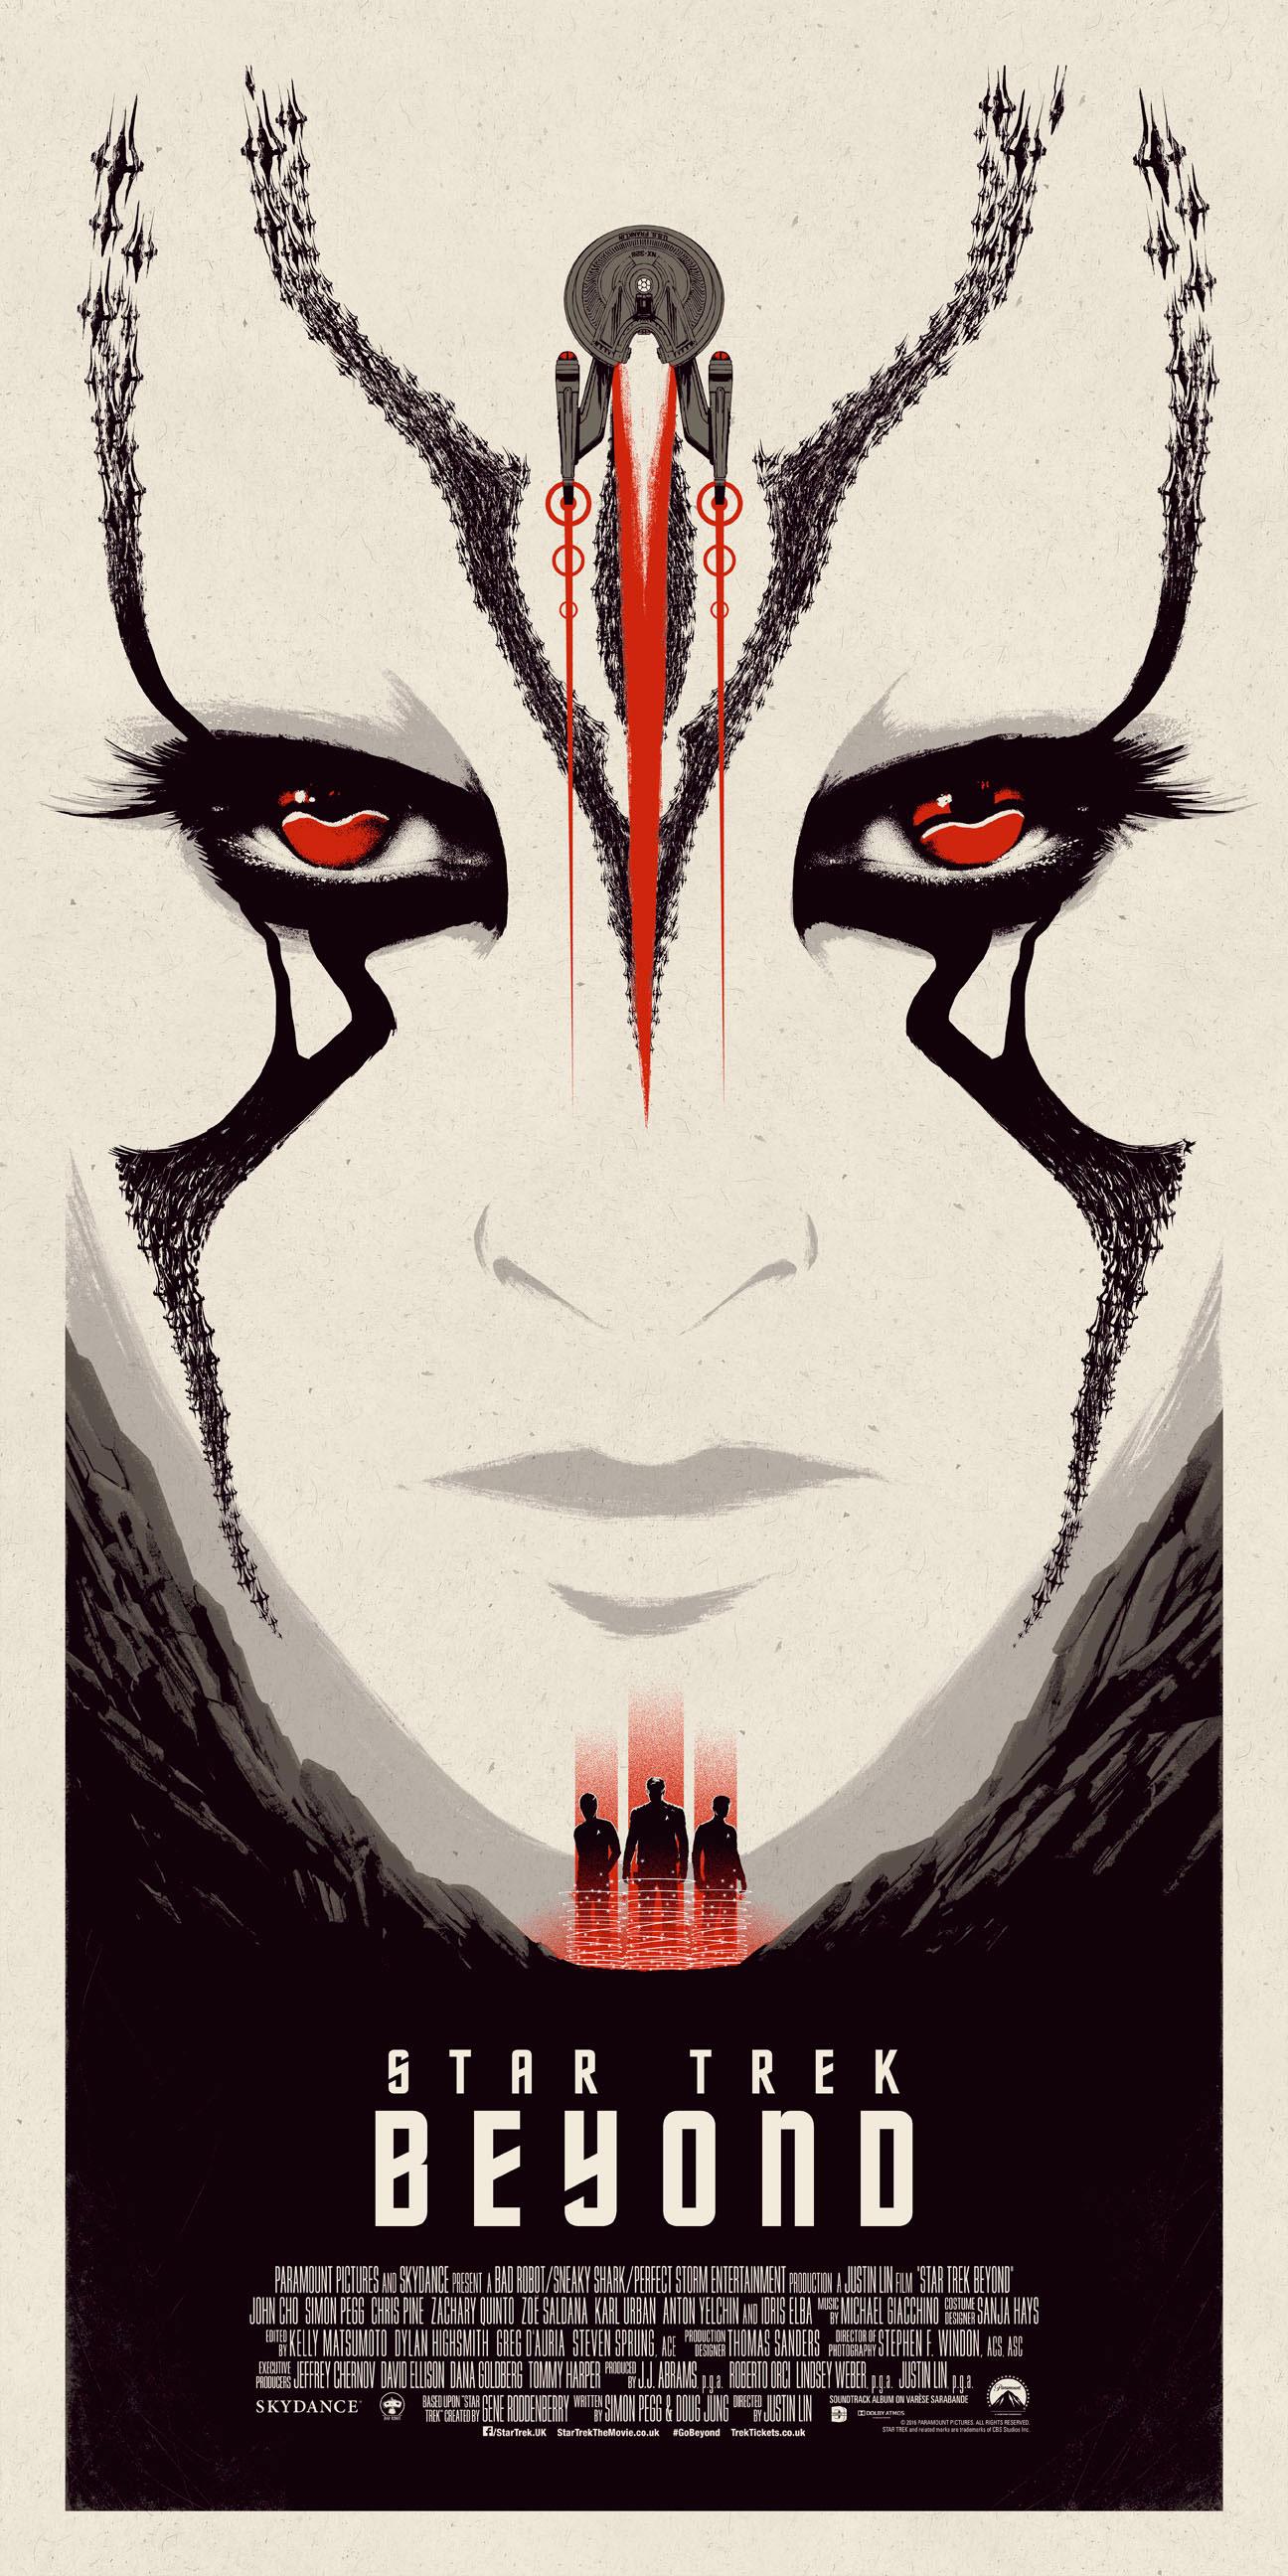 Star Trek Beyond – Red poster